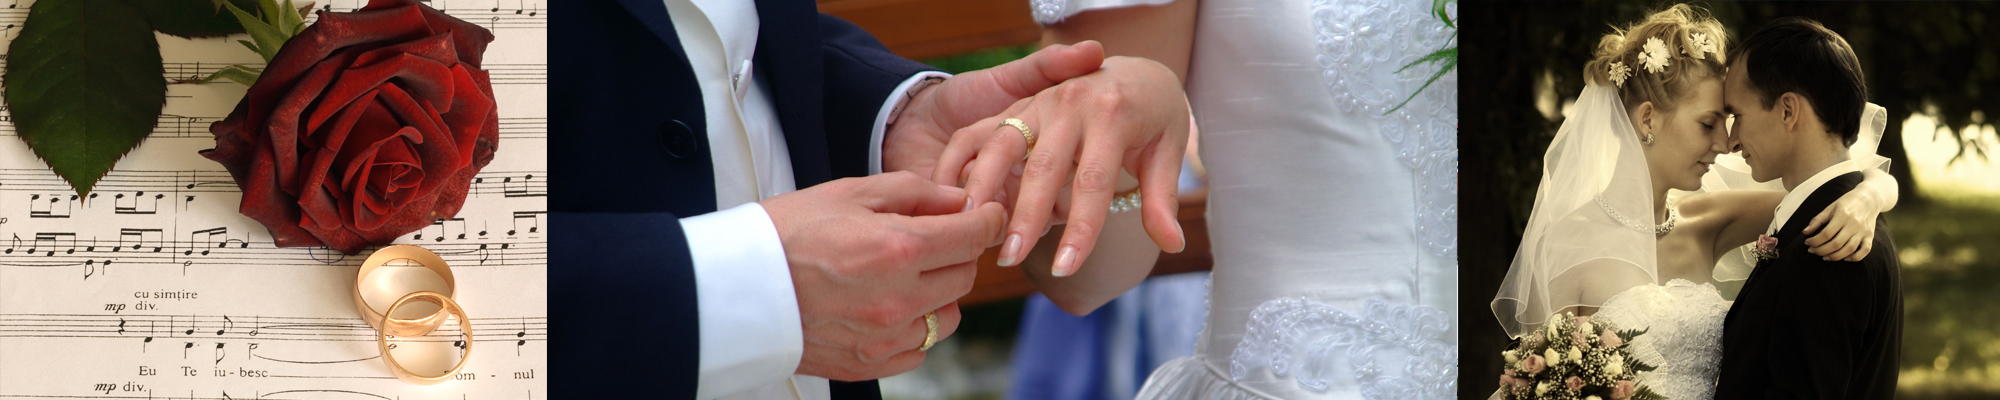 Ehevorbereitungskurse